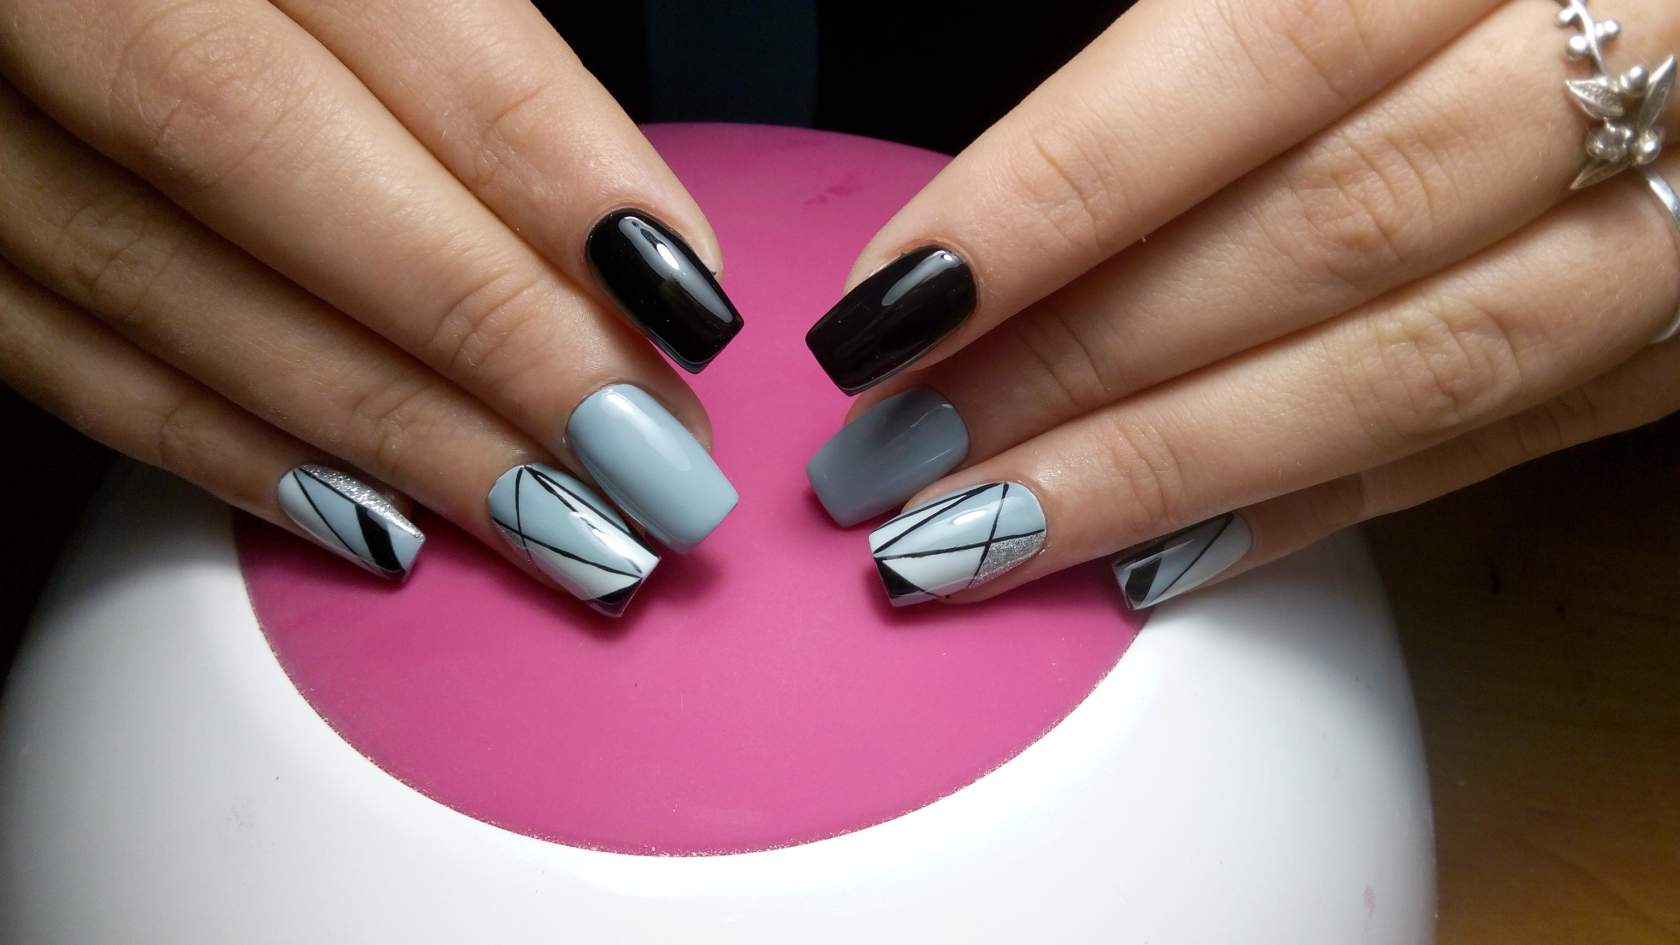 тенденция дизайна ногтей весна 25 года геометрия